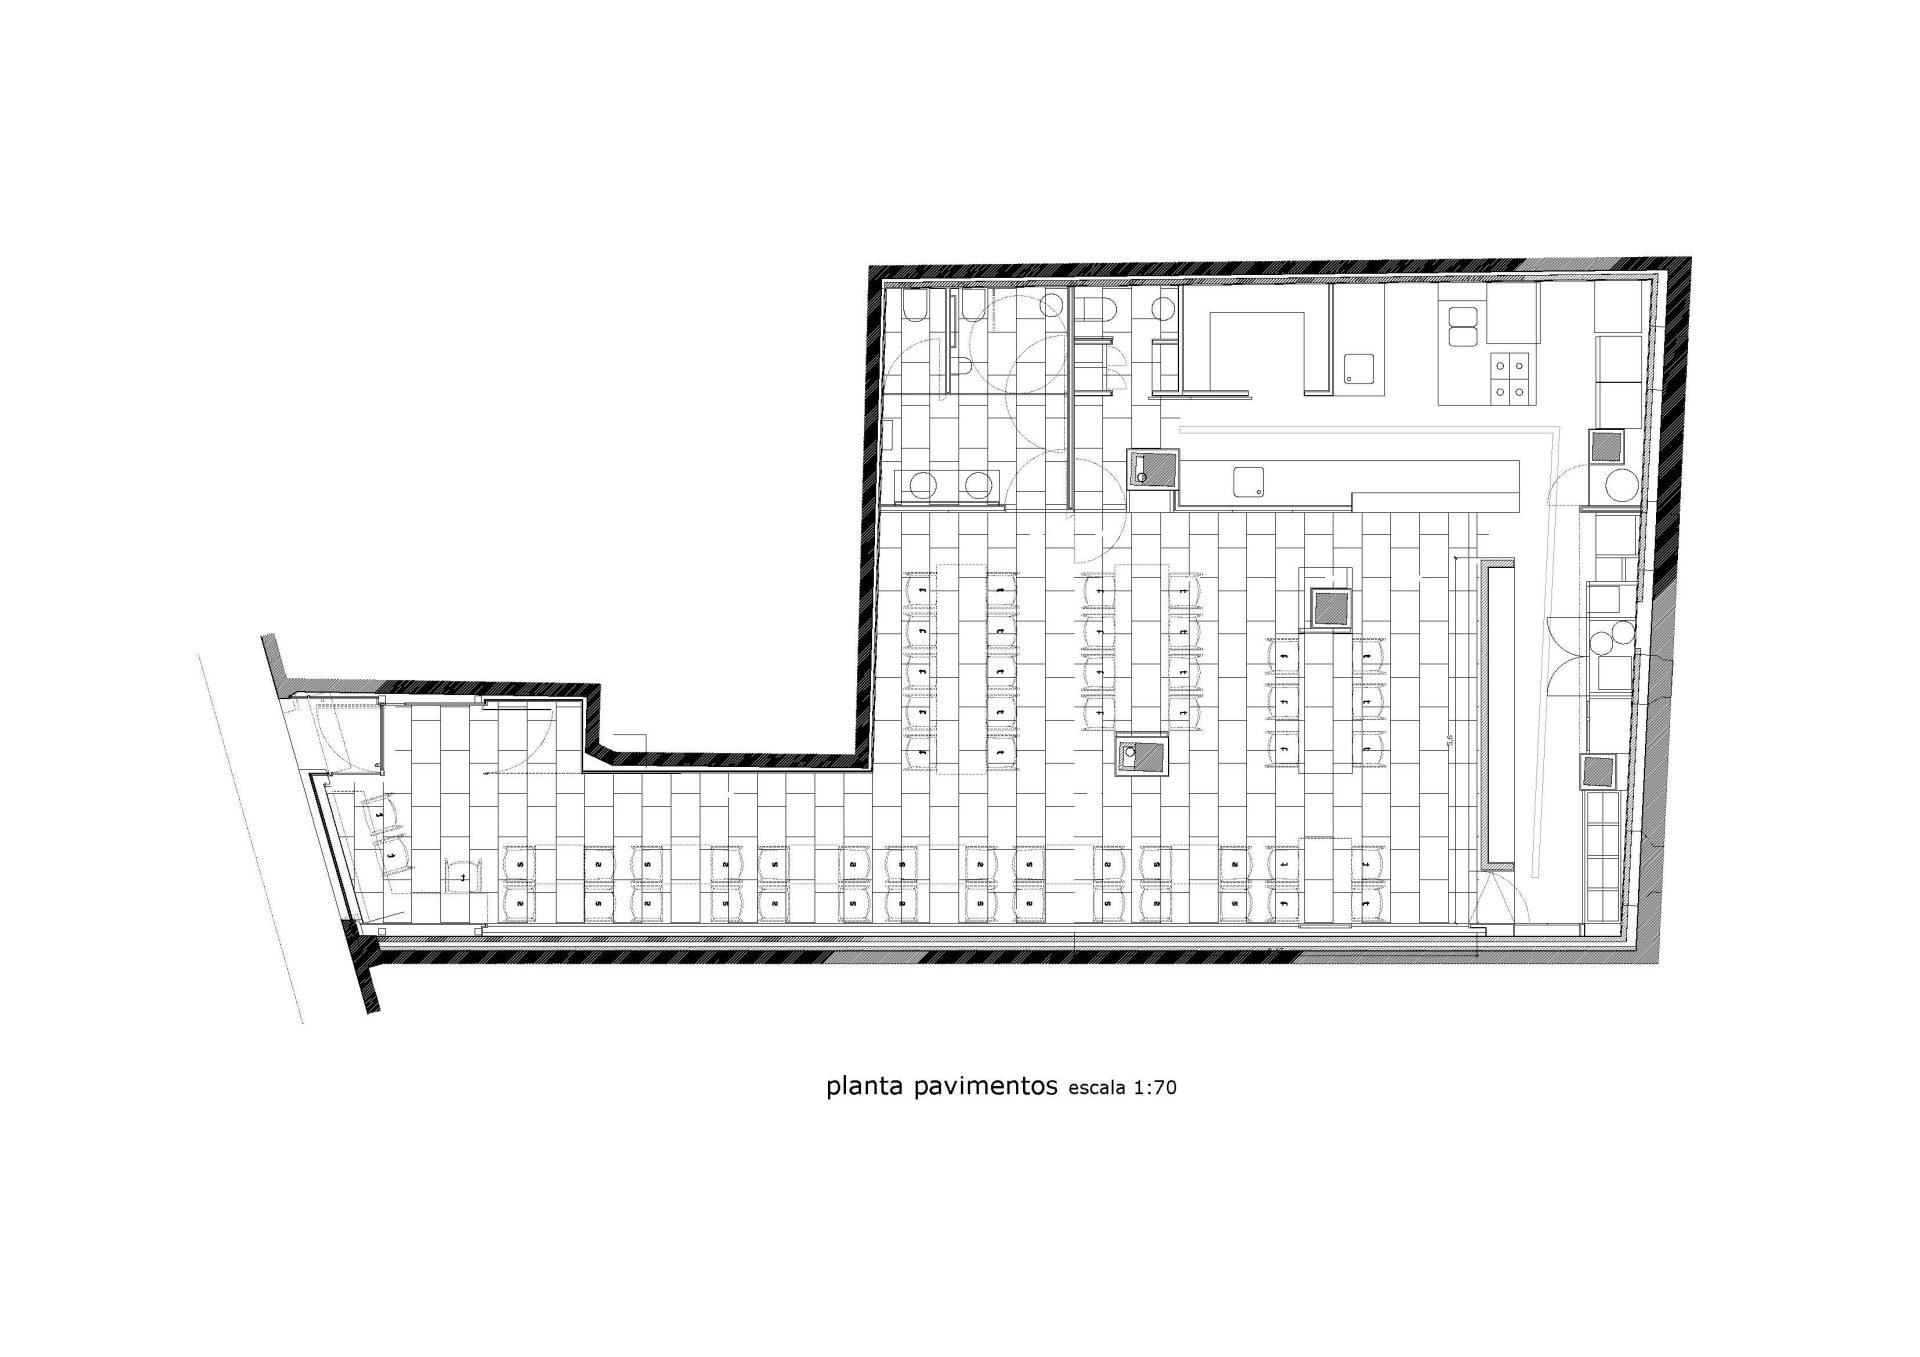 01_planta arquitectura planta pavimentos